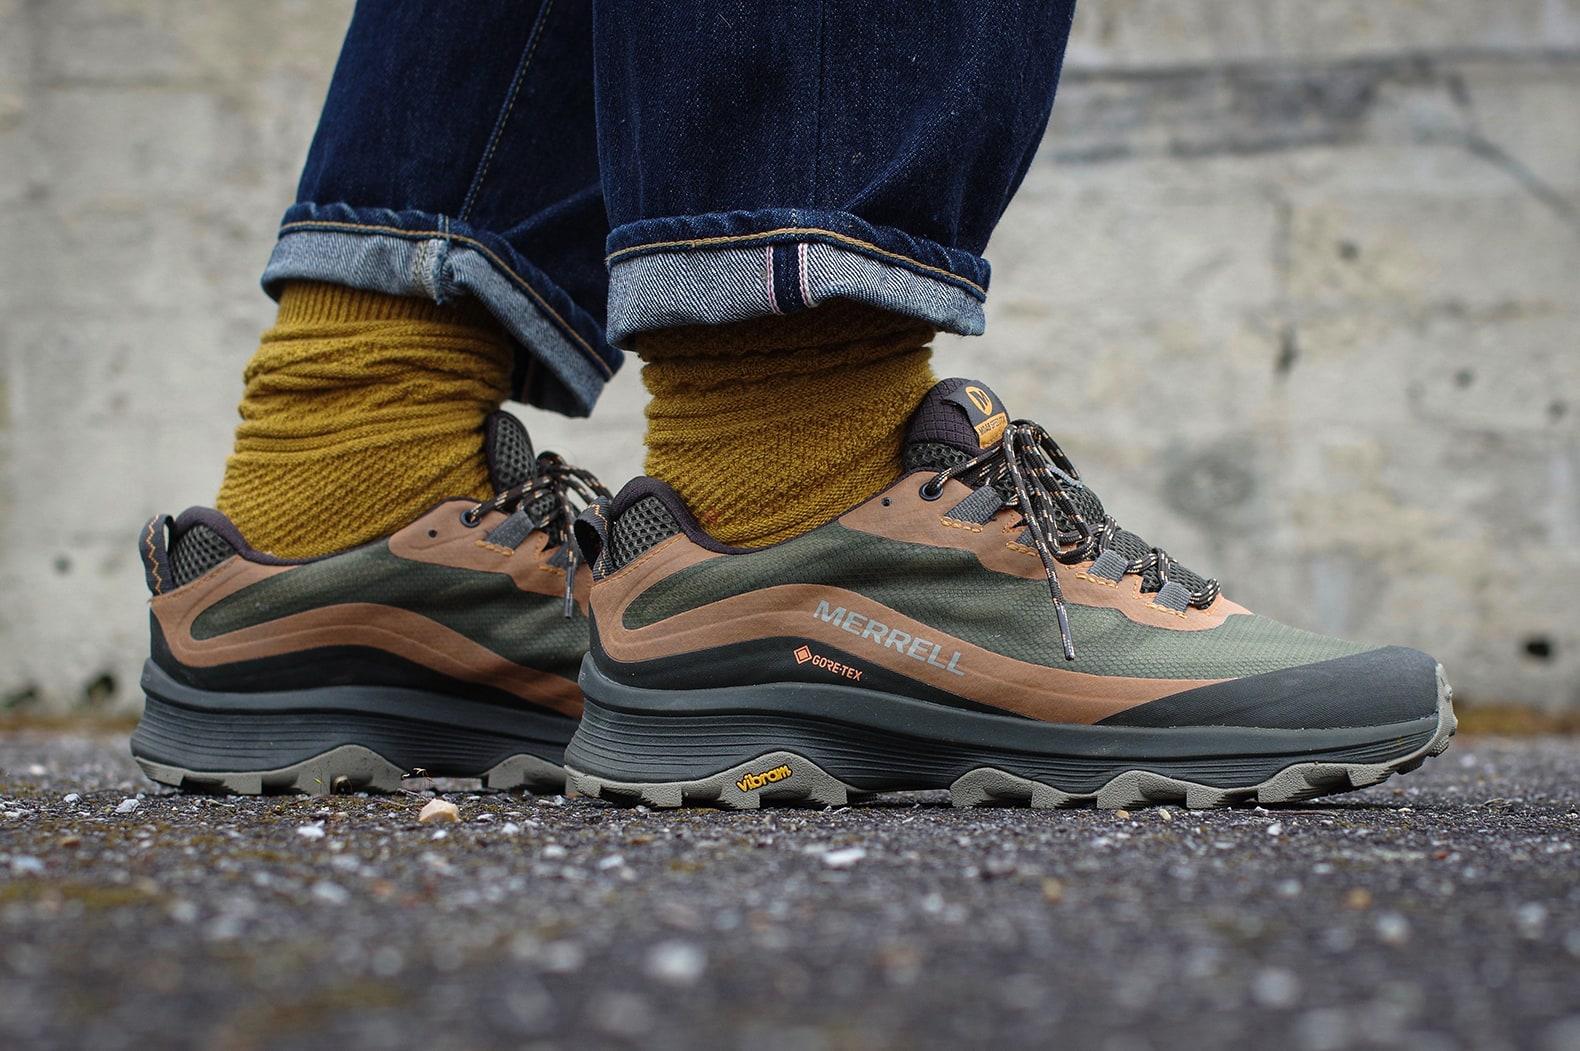 merrell-moab-speed-gtxgreen avec chaussettes royalties paris